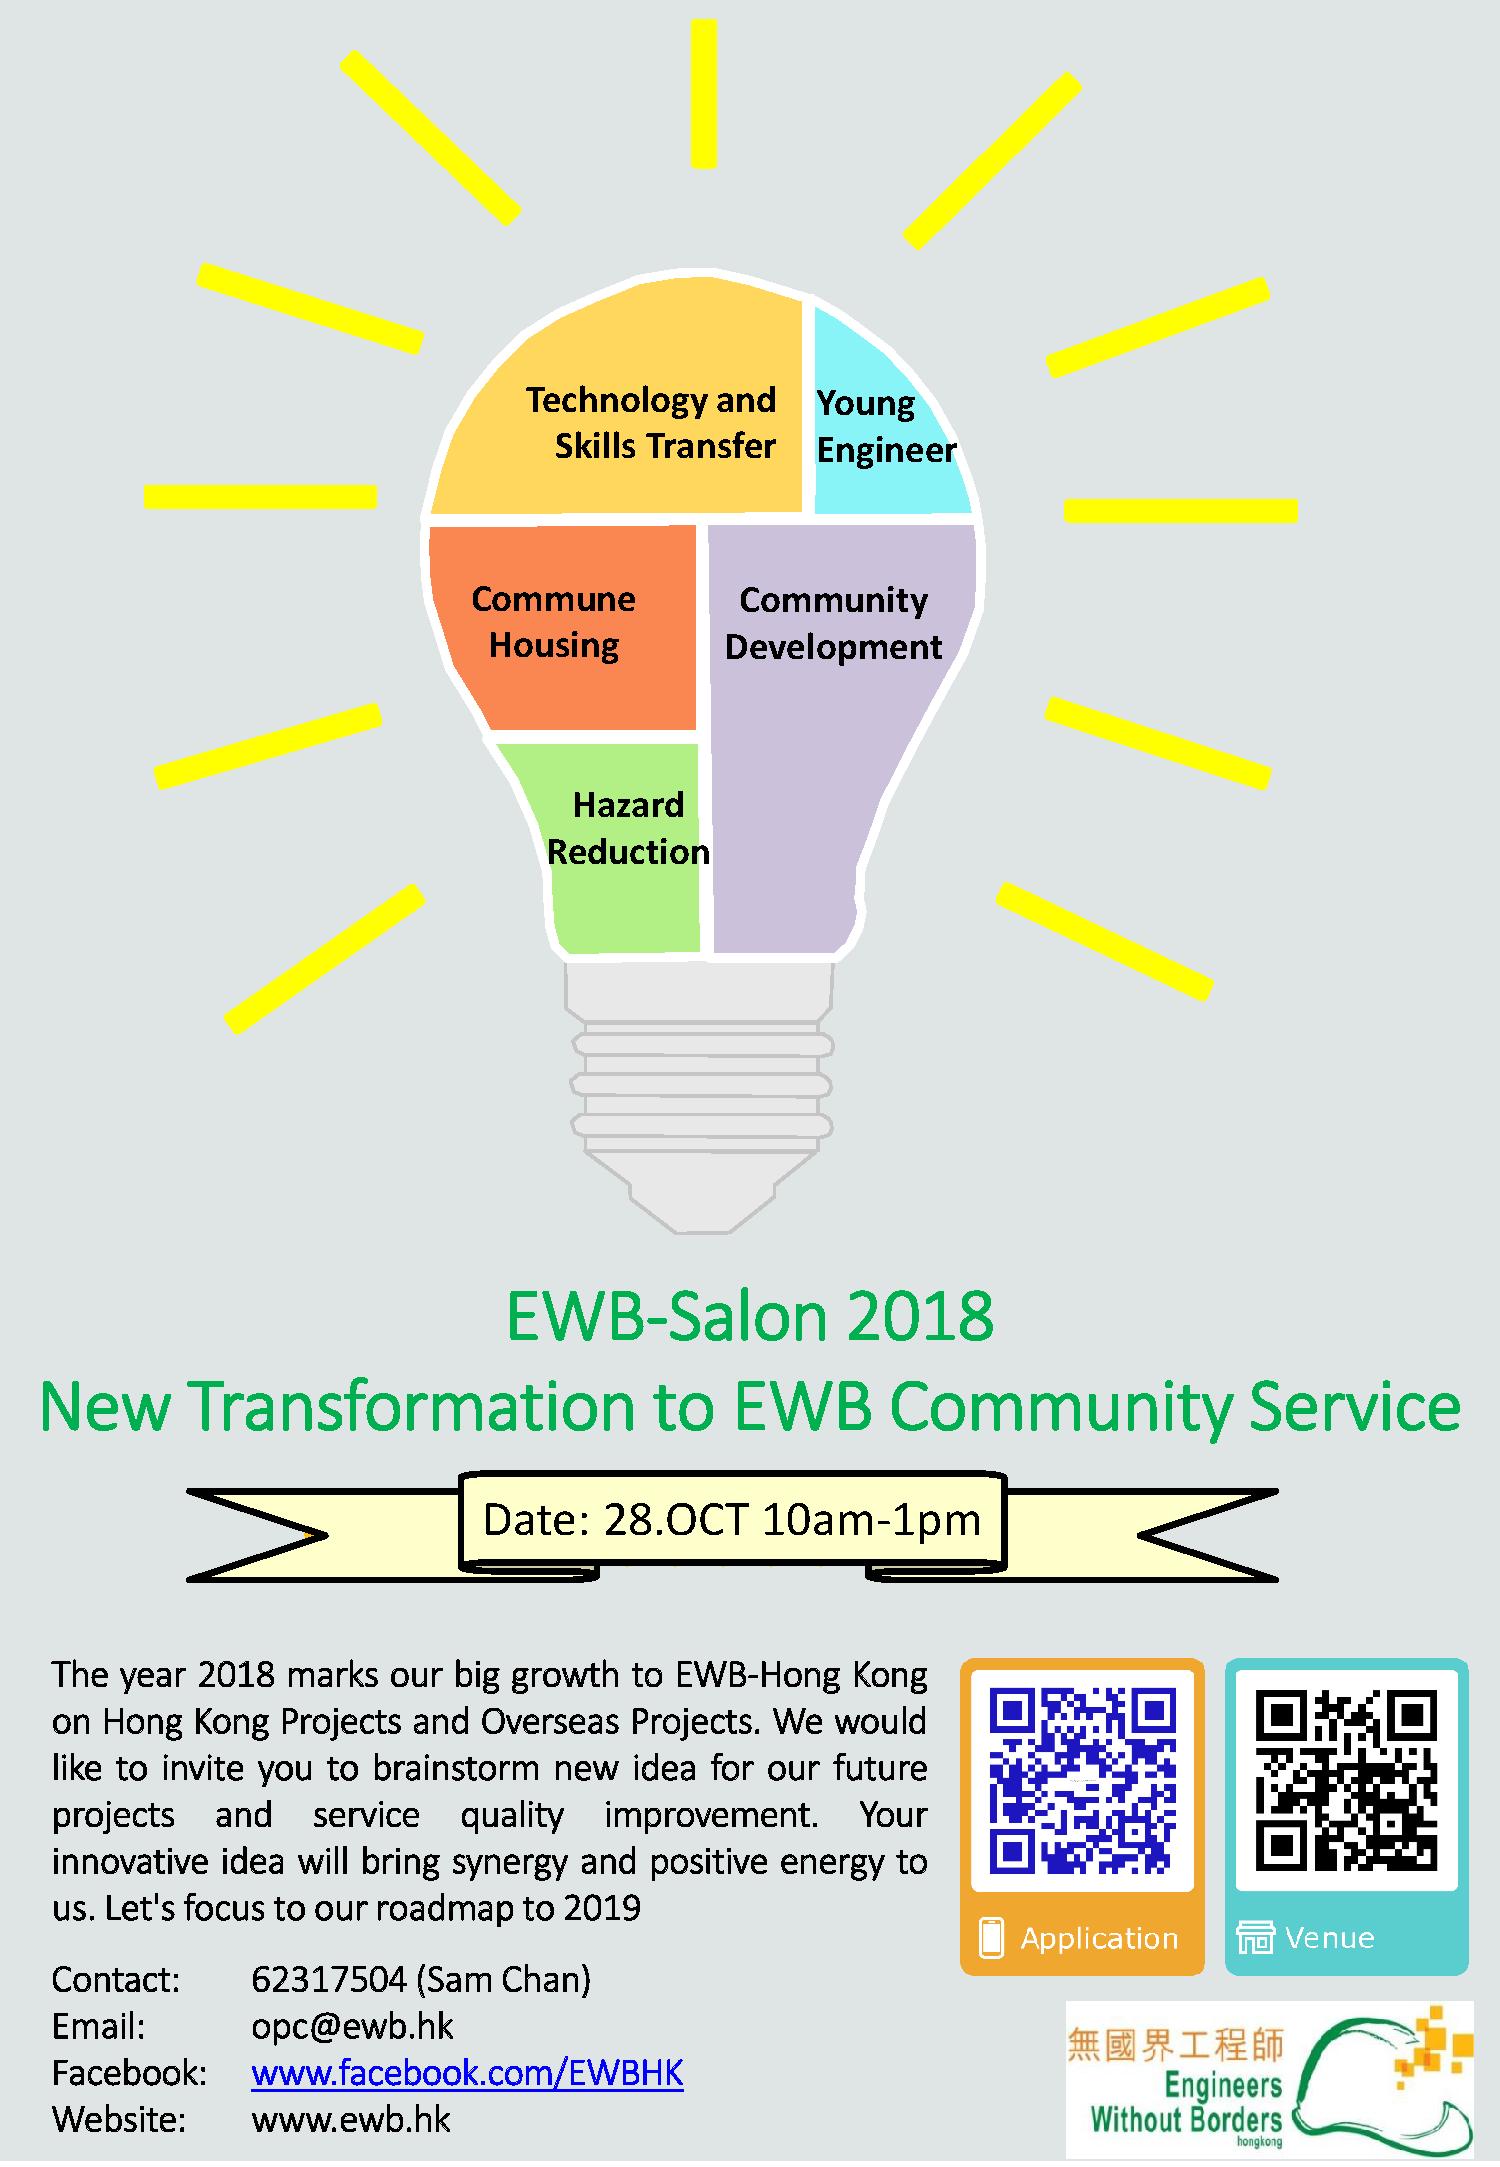 20180917_EWB-Salon 2018 poster(Draft).png